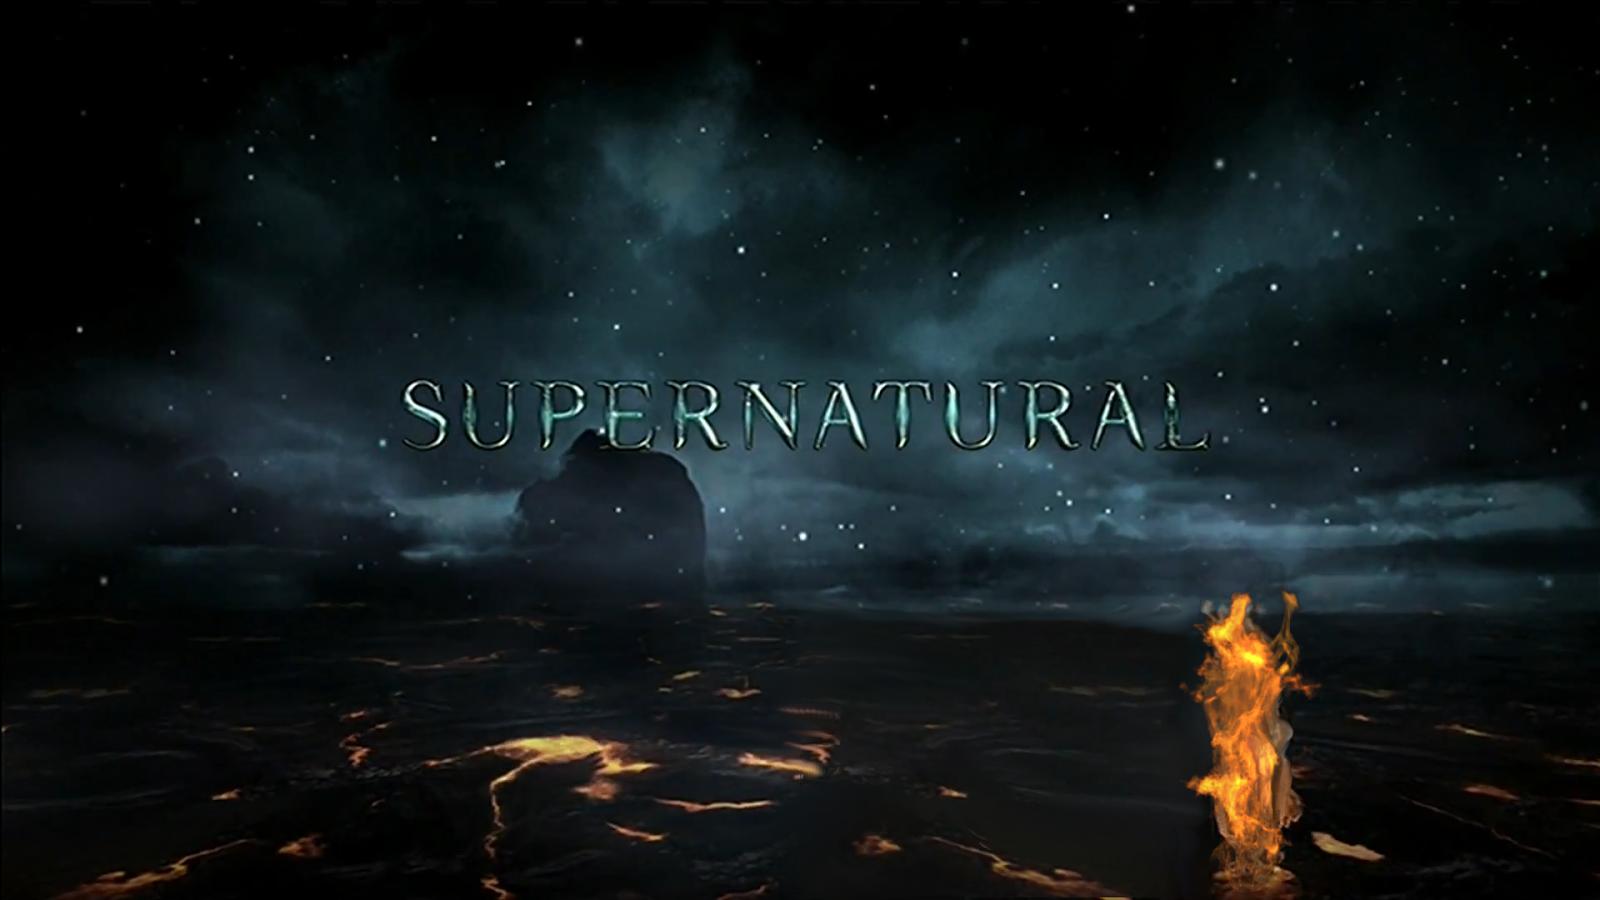 Supernatural season 6 wallpaper wallpapersafari supernatural wallpaper widescreen season 9 download supernatural theme 1600x900 voltagebd Gallery